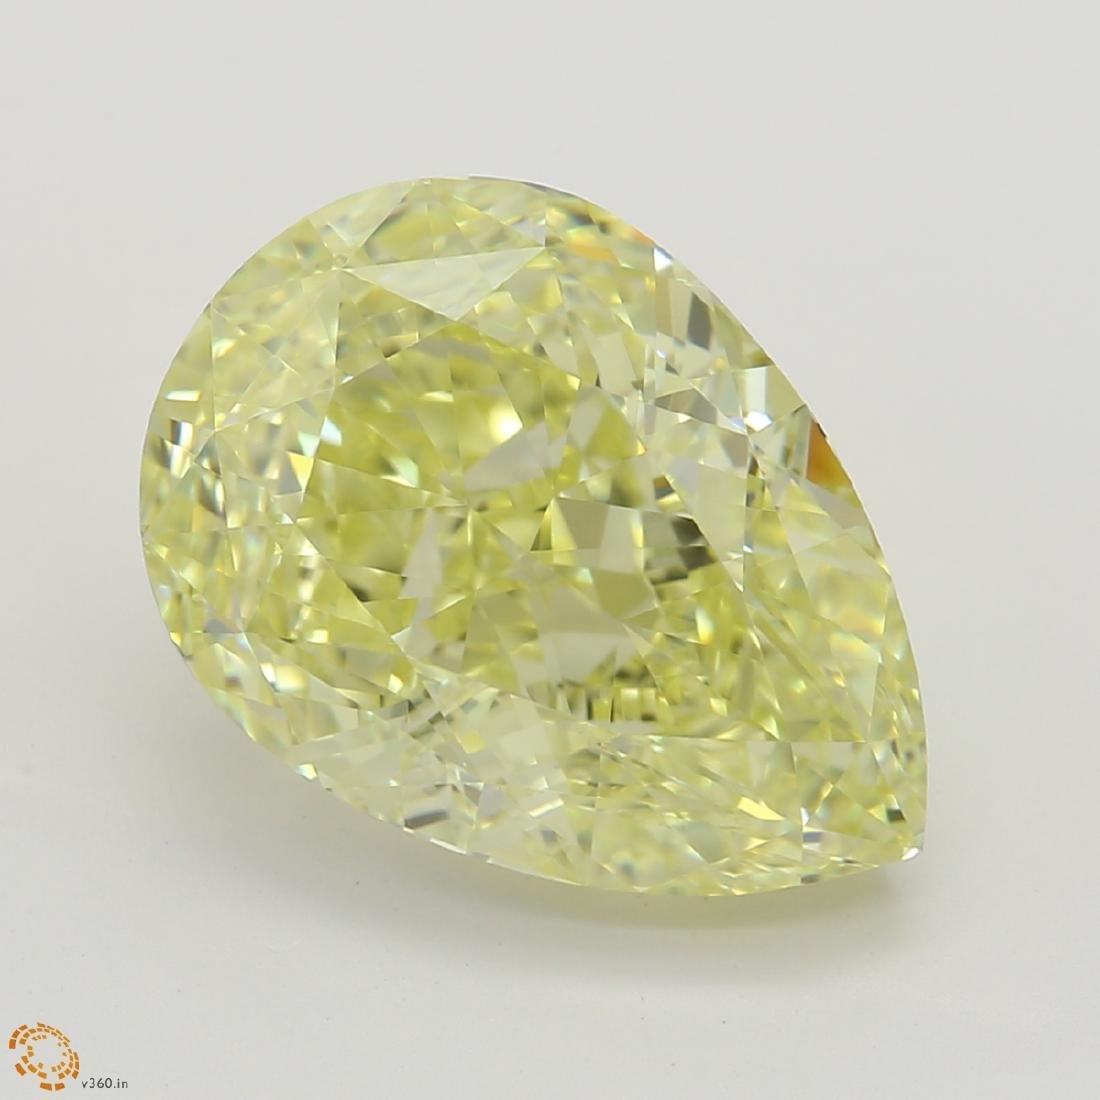 3.75 ct, Yellow/IF, Pear cut Diamond